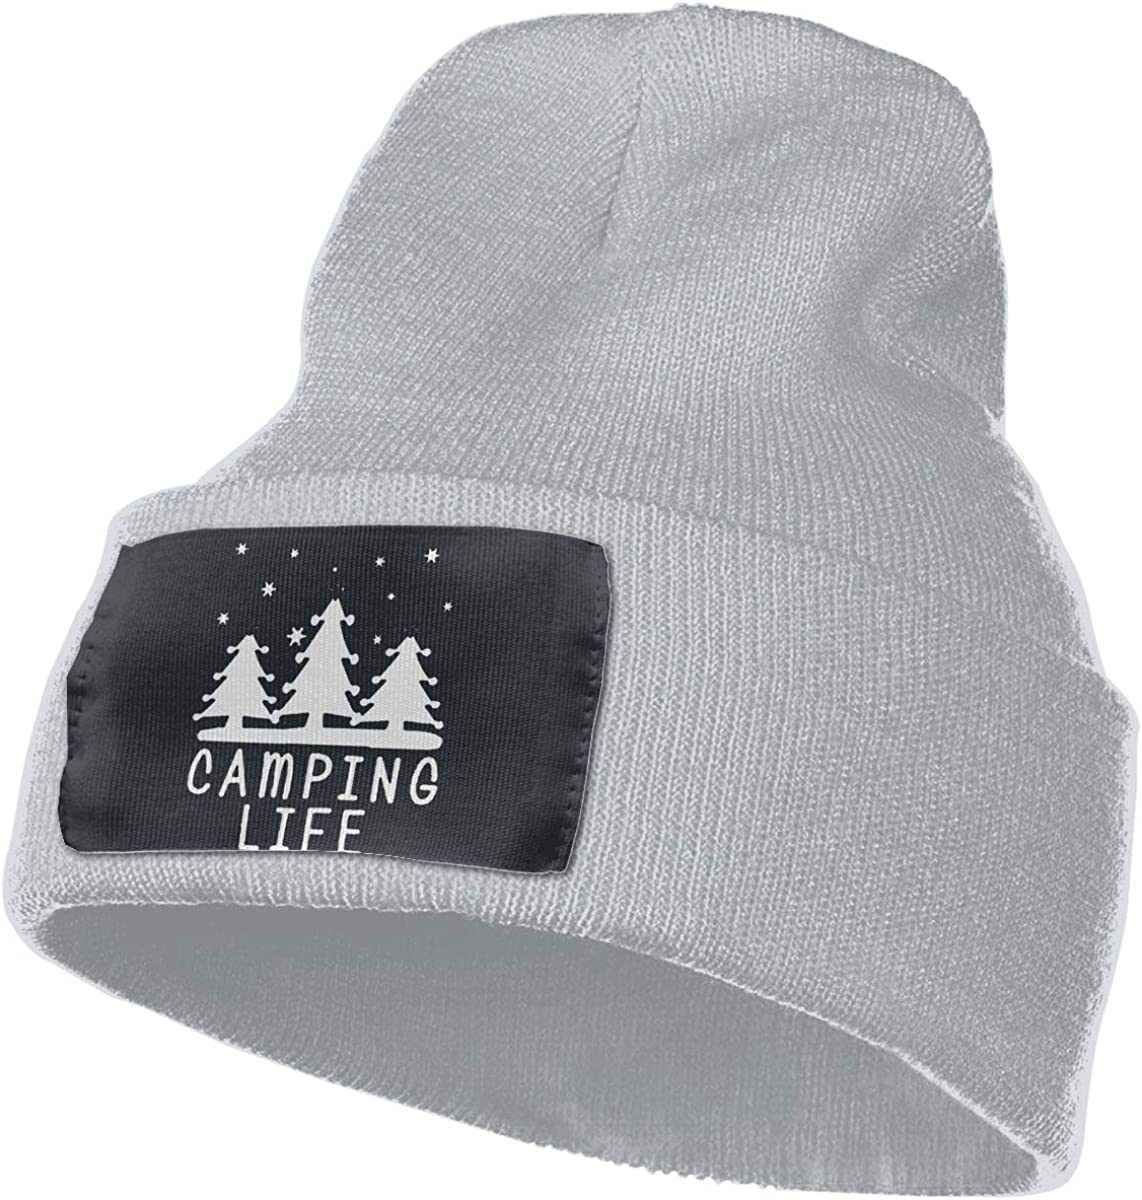 Beanie Camping Sign Happy Camper Knitted Hat Winter Skullcap Men Women